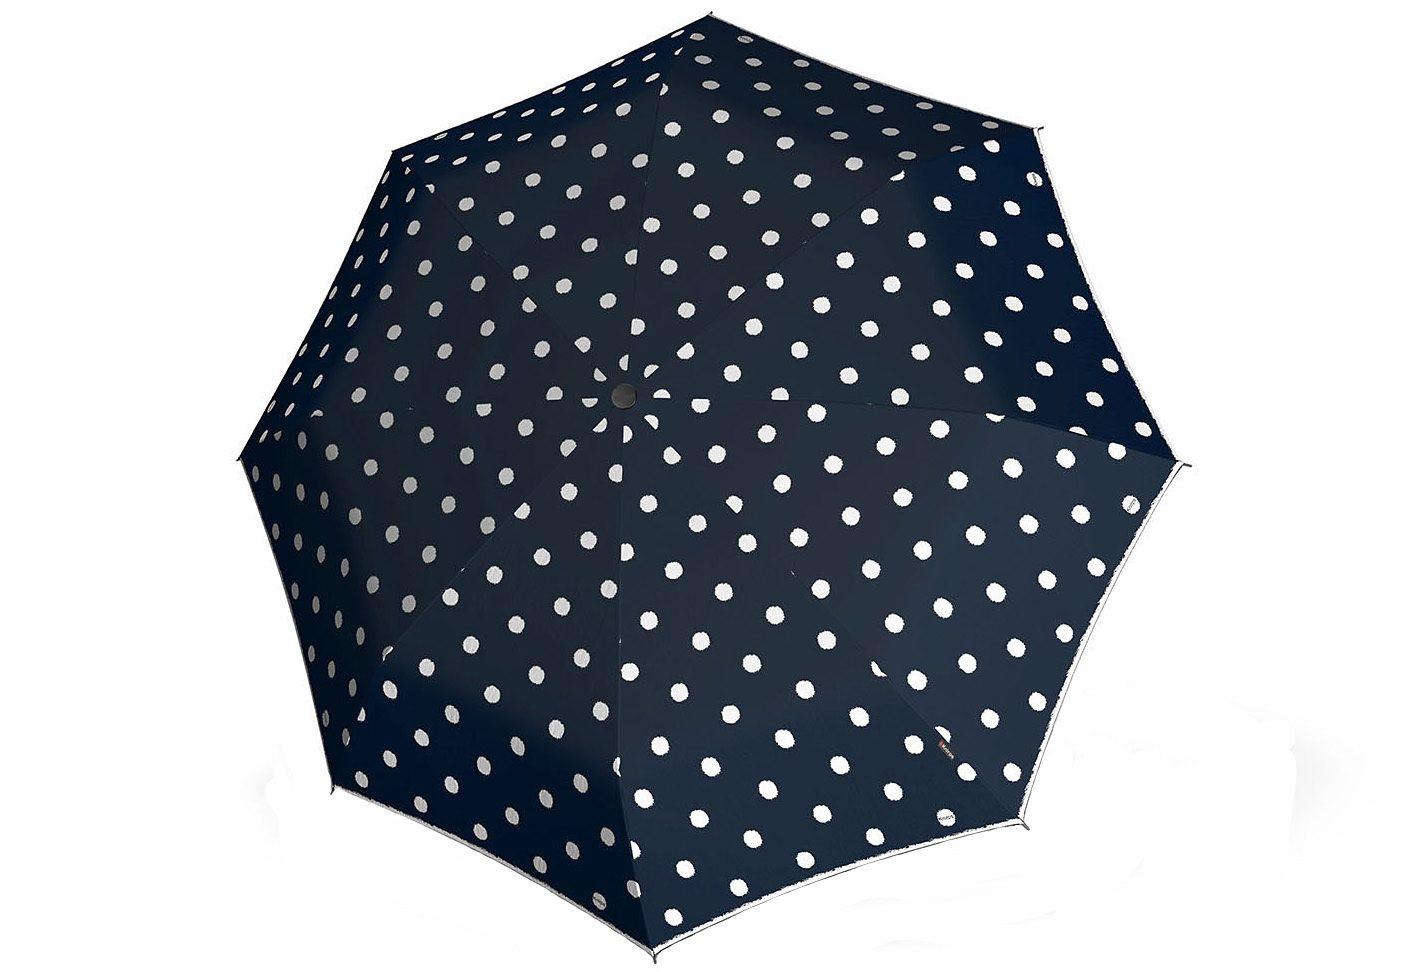 Knirps Regenschirm, »Stick Langschirm Automatik - Punkte blau«